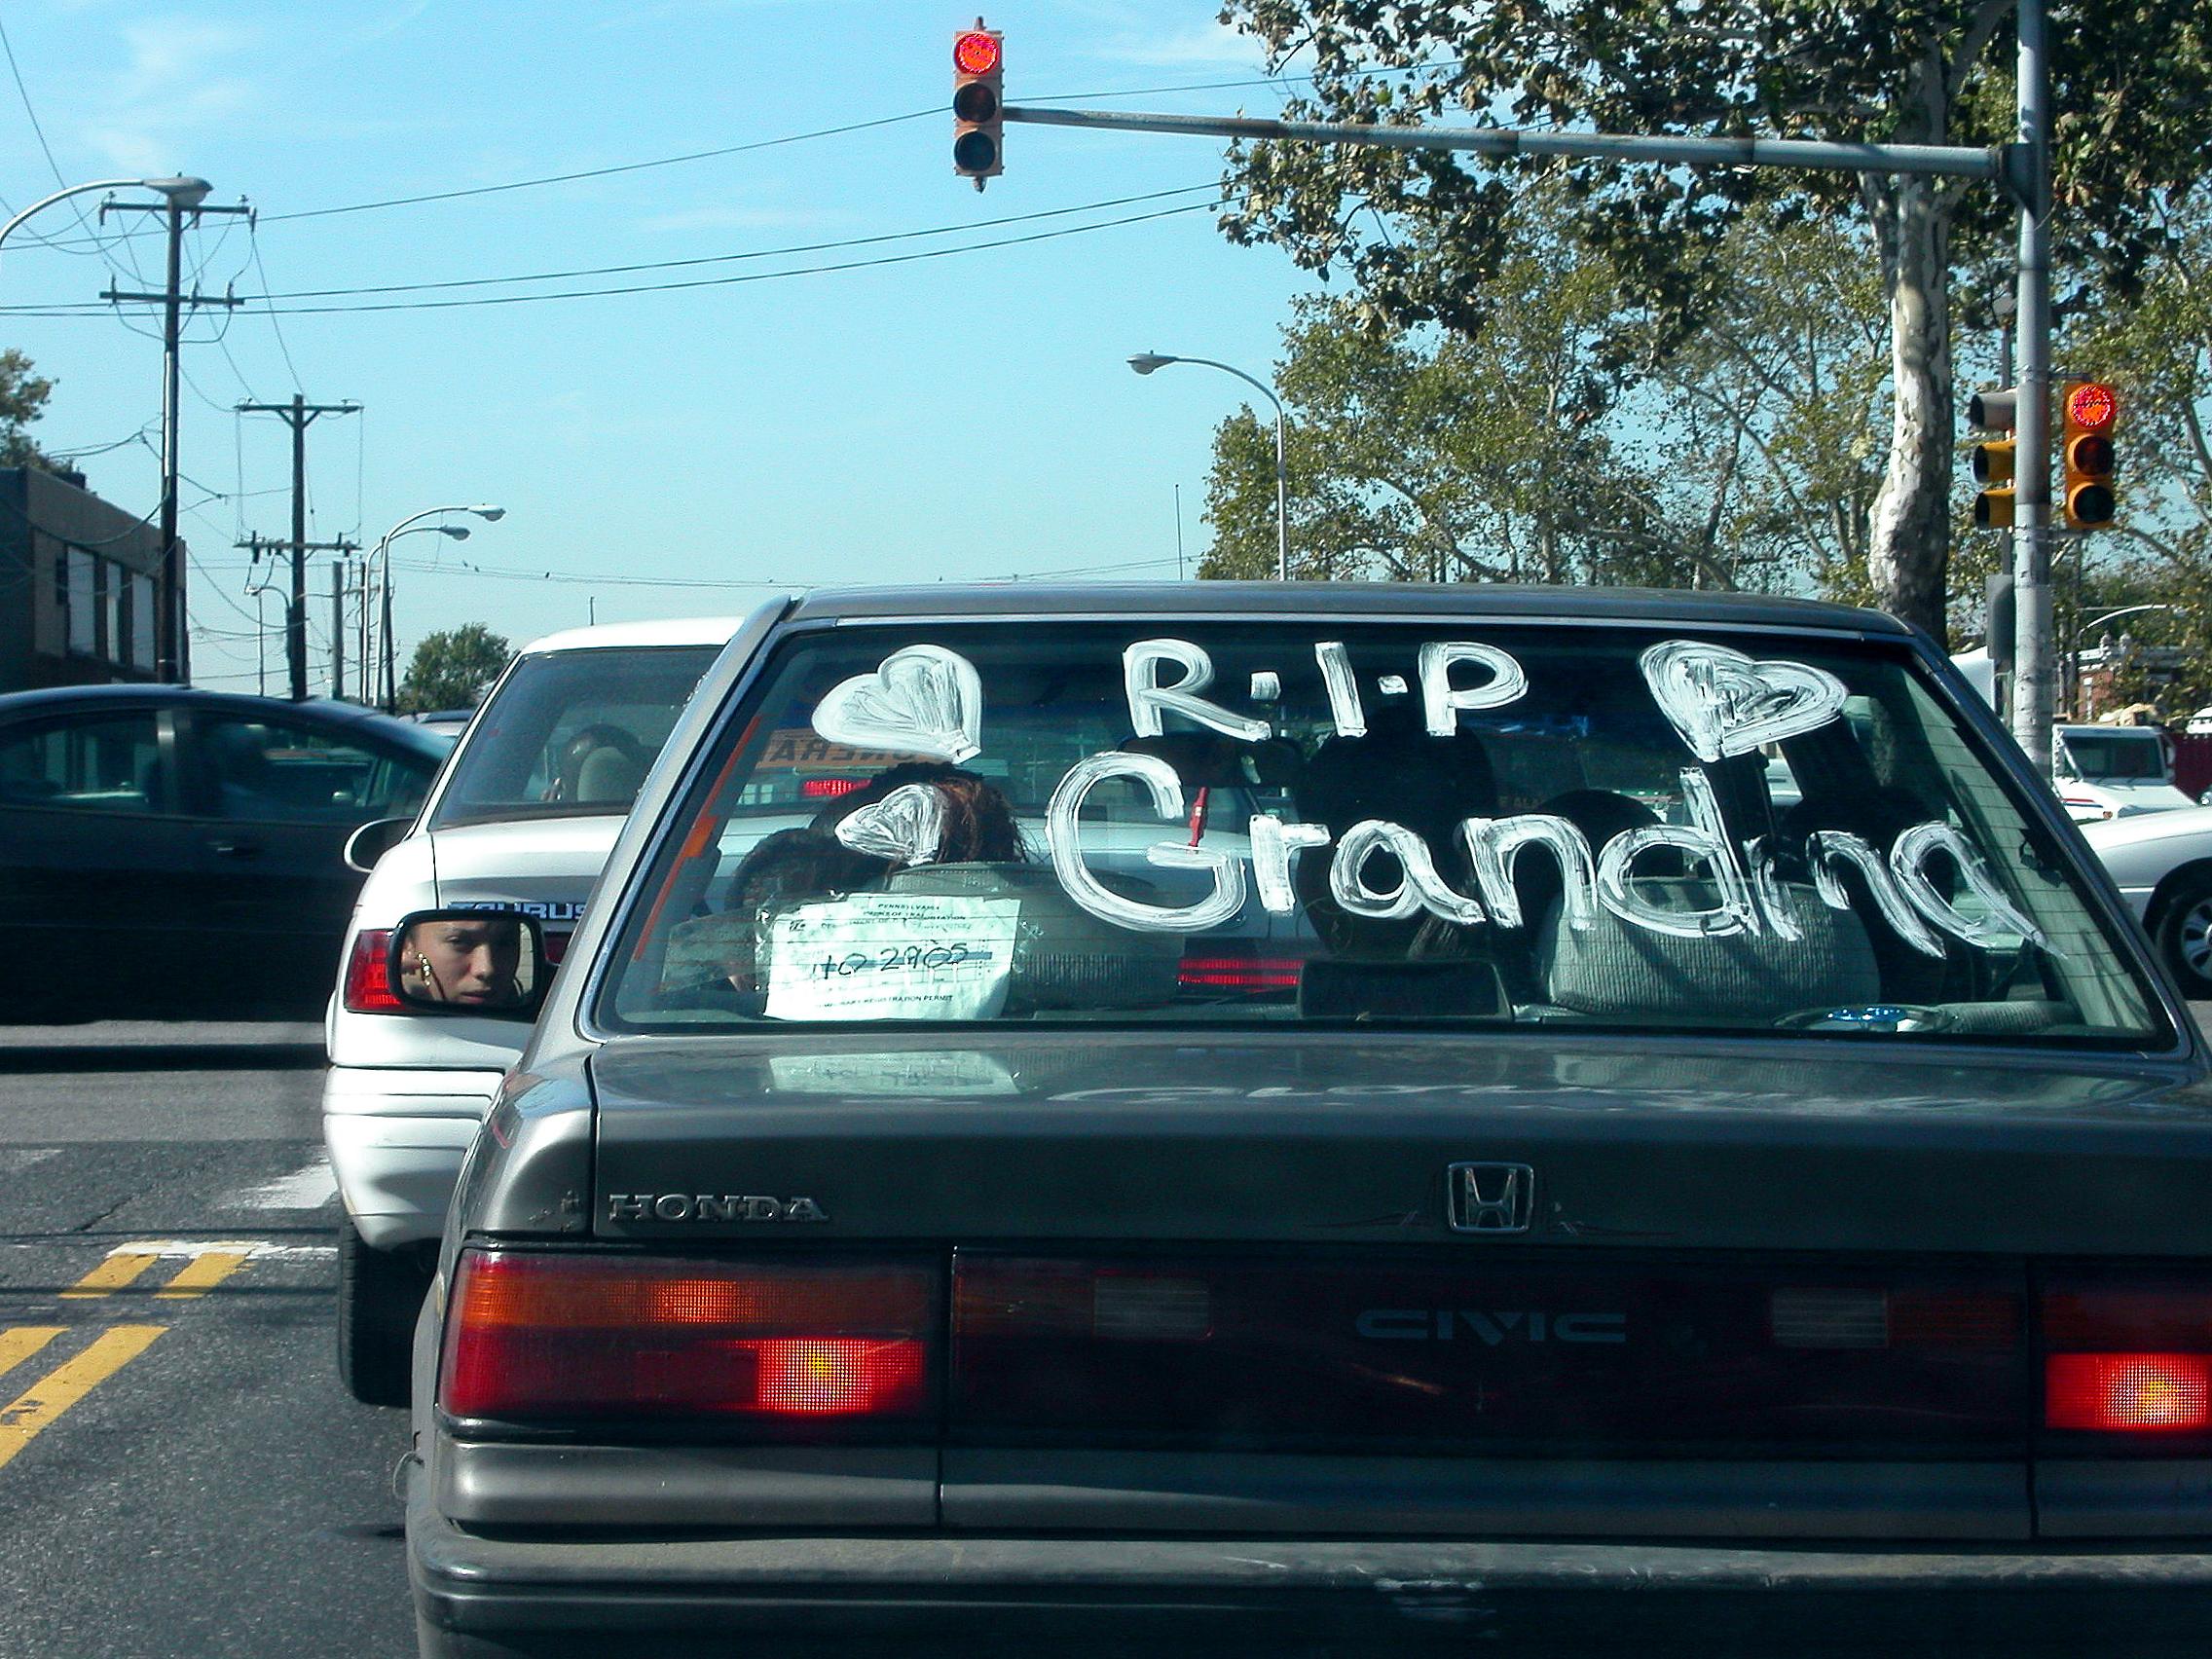 W.M. Grandma, Philadelphia